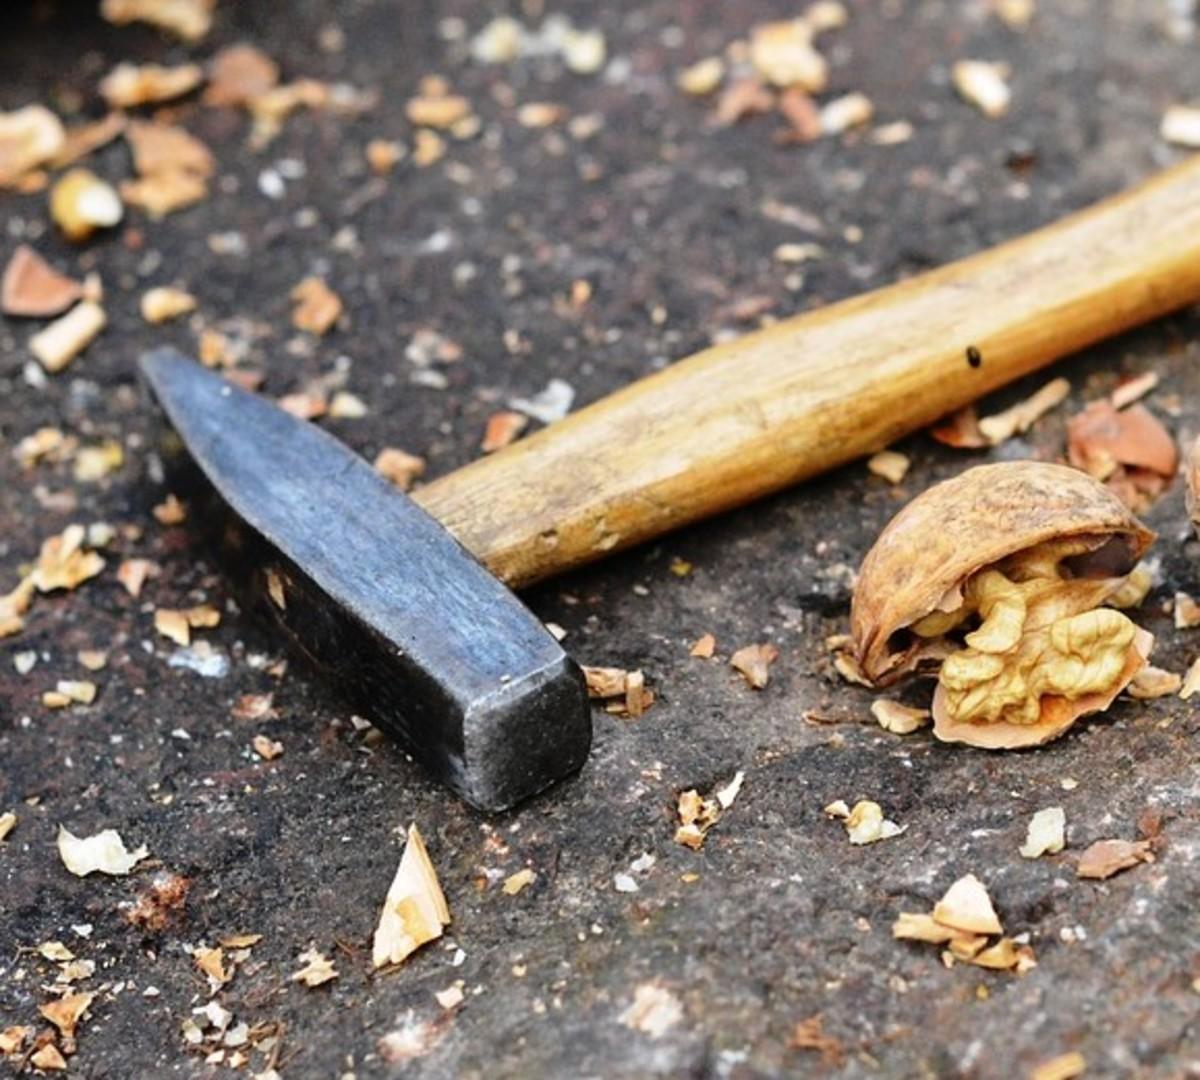 Cracking nut shells to make ink